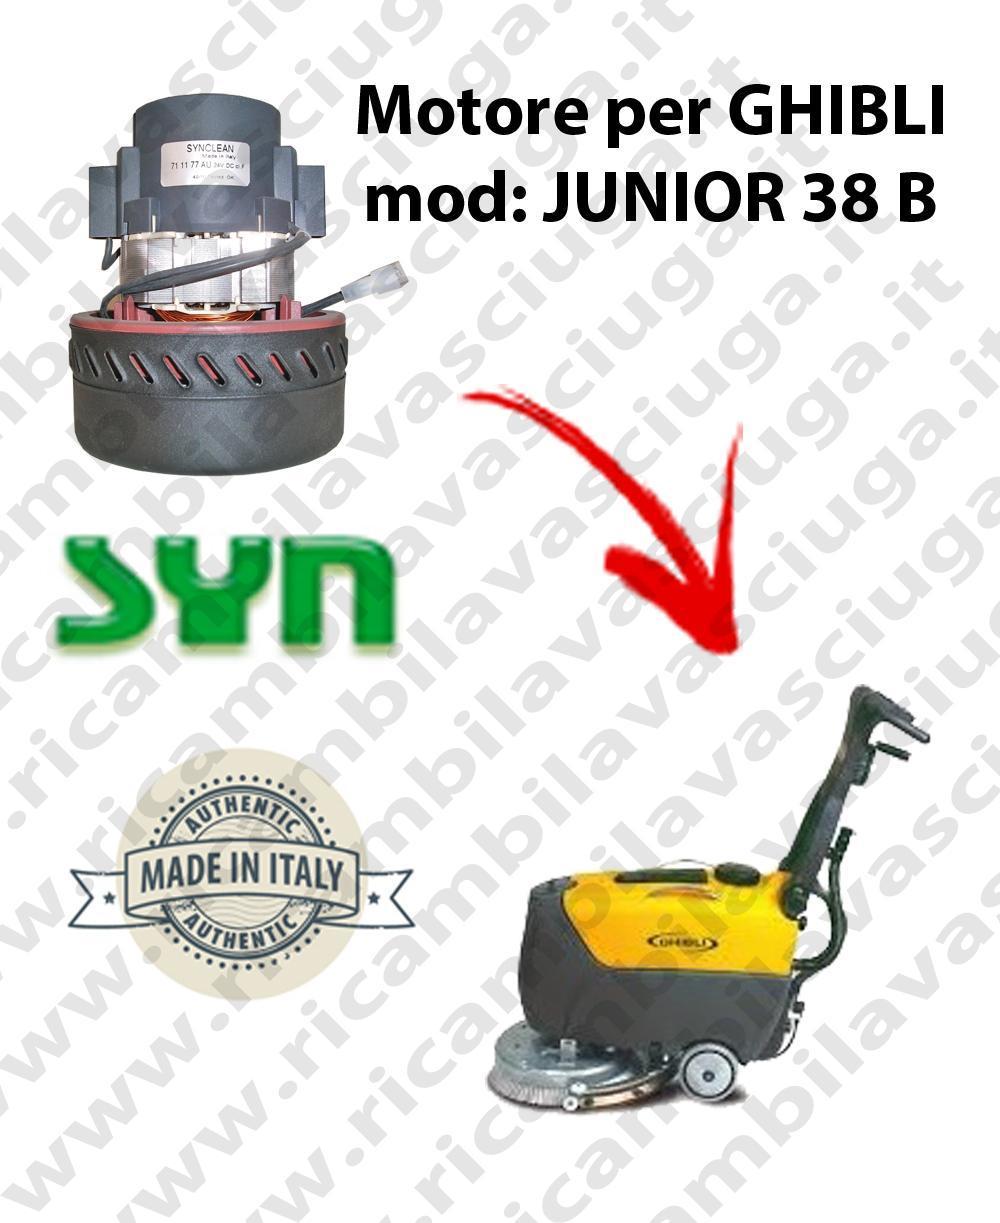 JUNIOR 38 B Vacuum motor SY NCLEAN for scrubber dryer GHIBLI